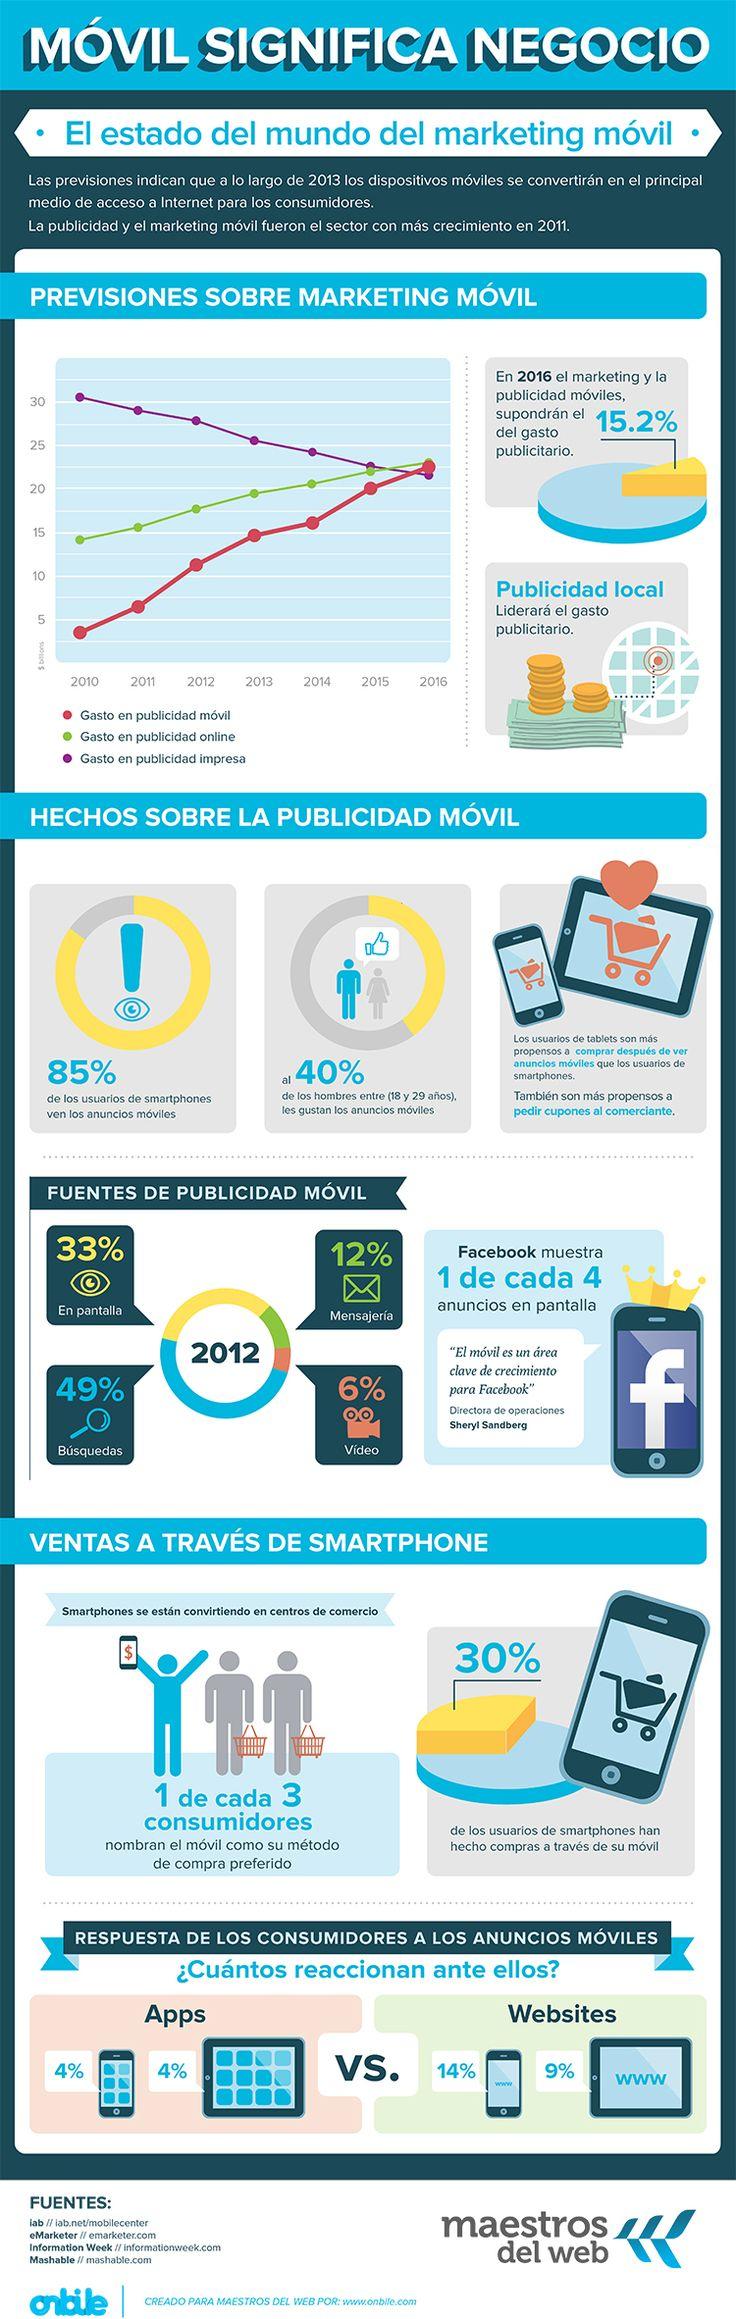 Móvil significa negocio: marketing móvil